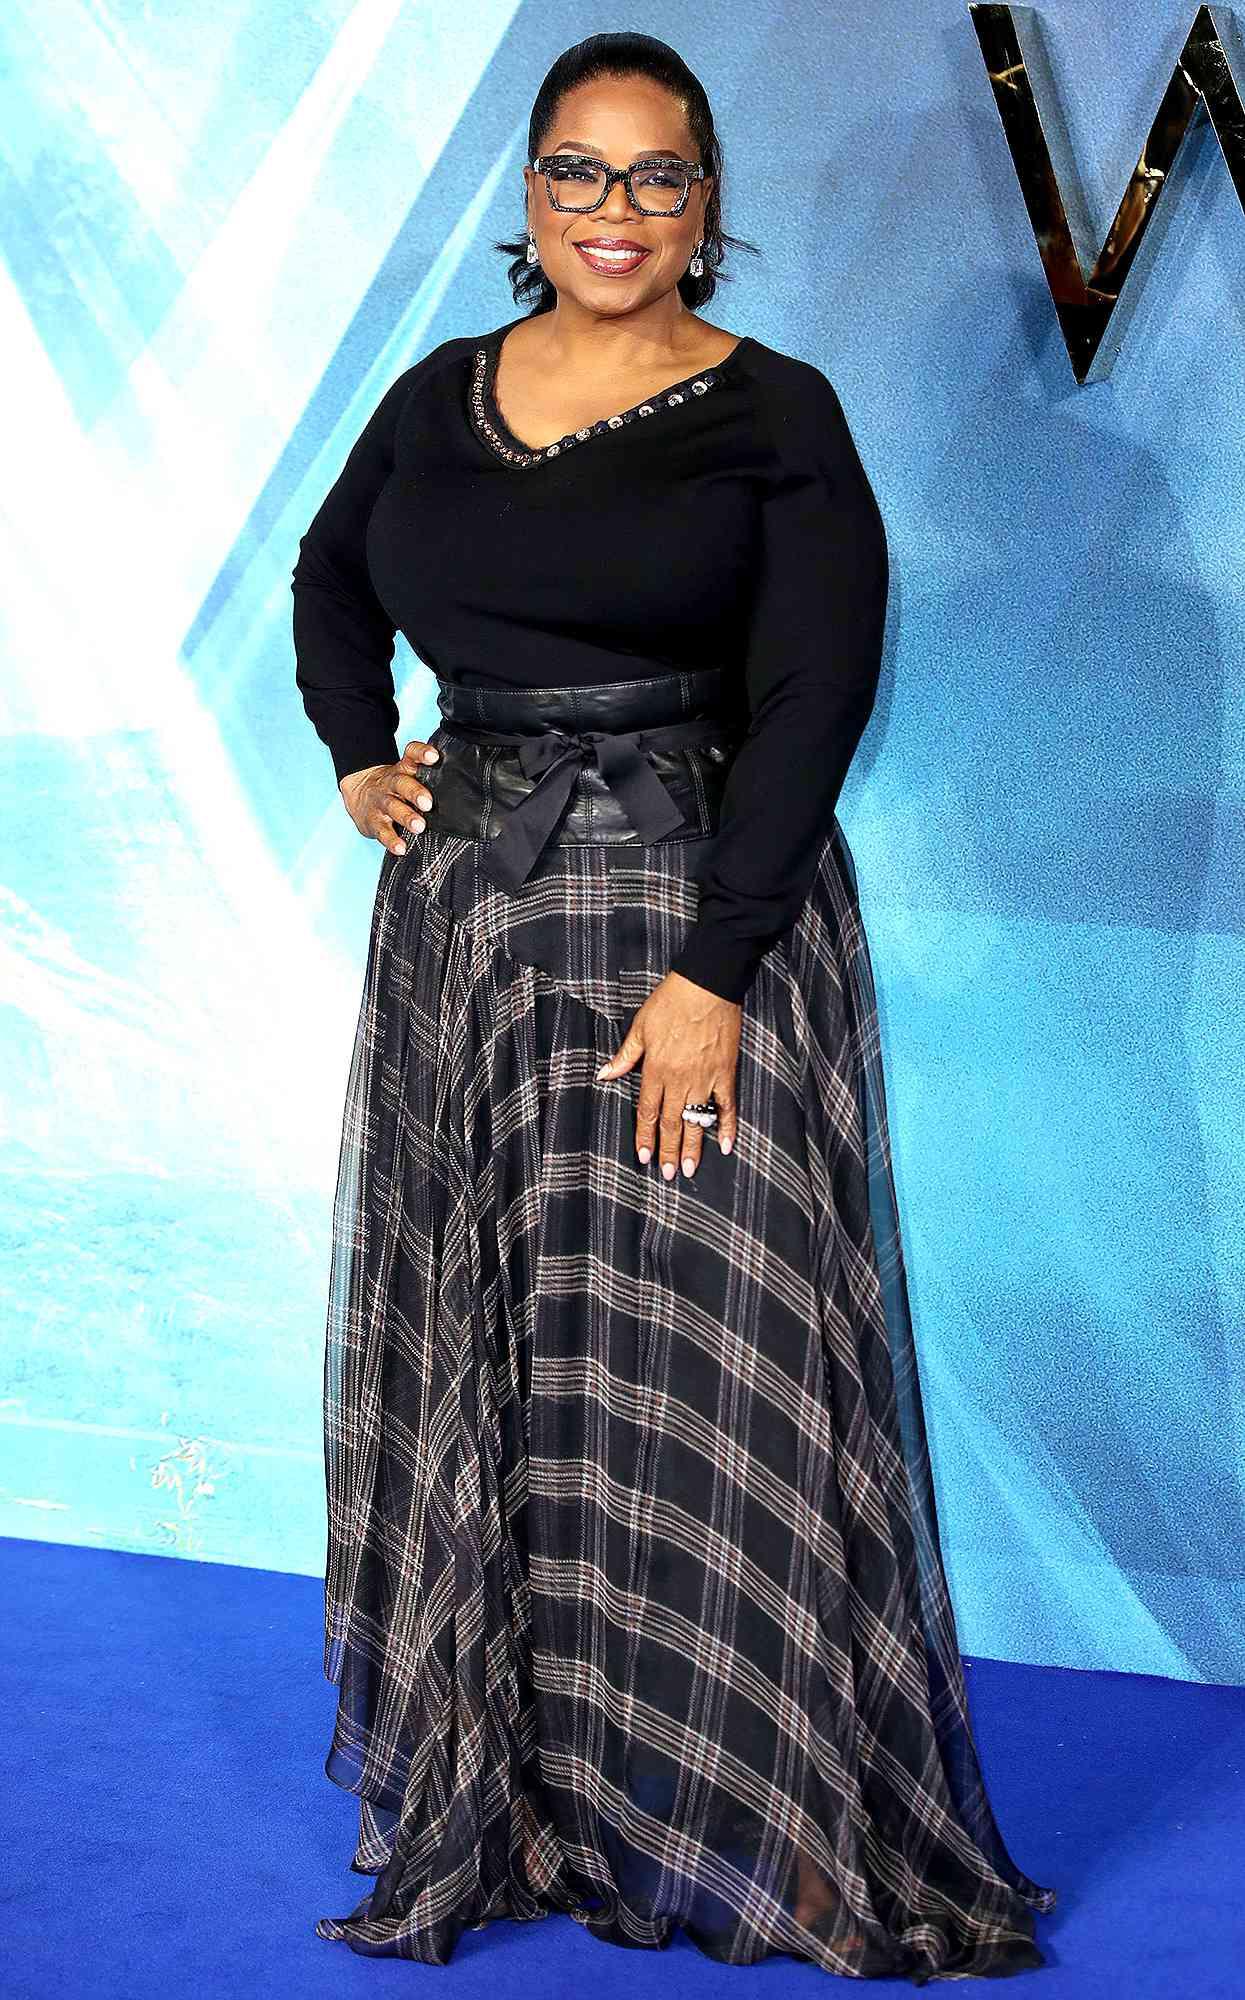 Oprah Weight Loss Surgery : oprah, weight, surgery, Oprah, Winfrey, Pre-Diabetic, Before, Losing, PEOPLE.com